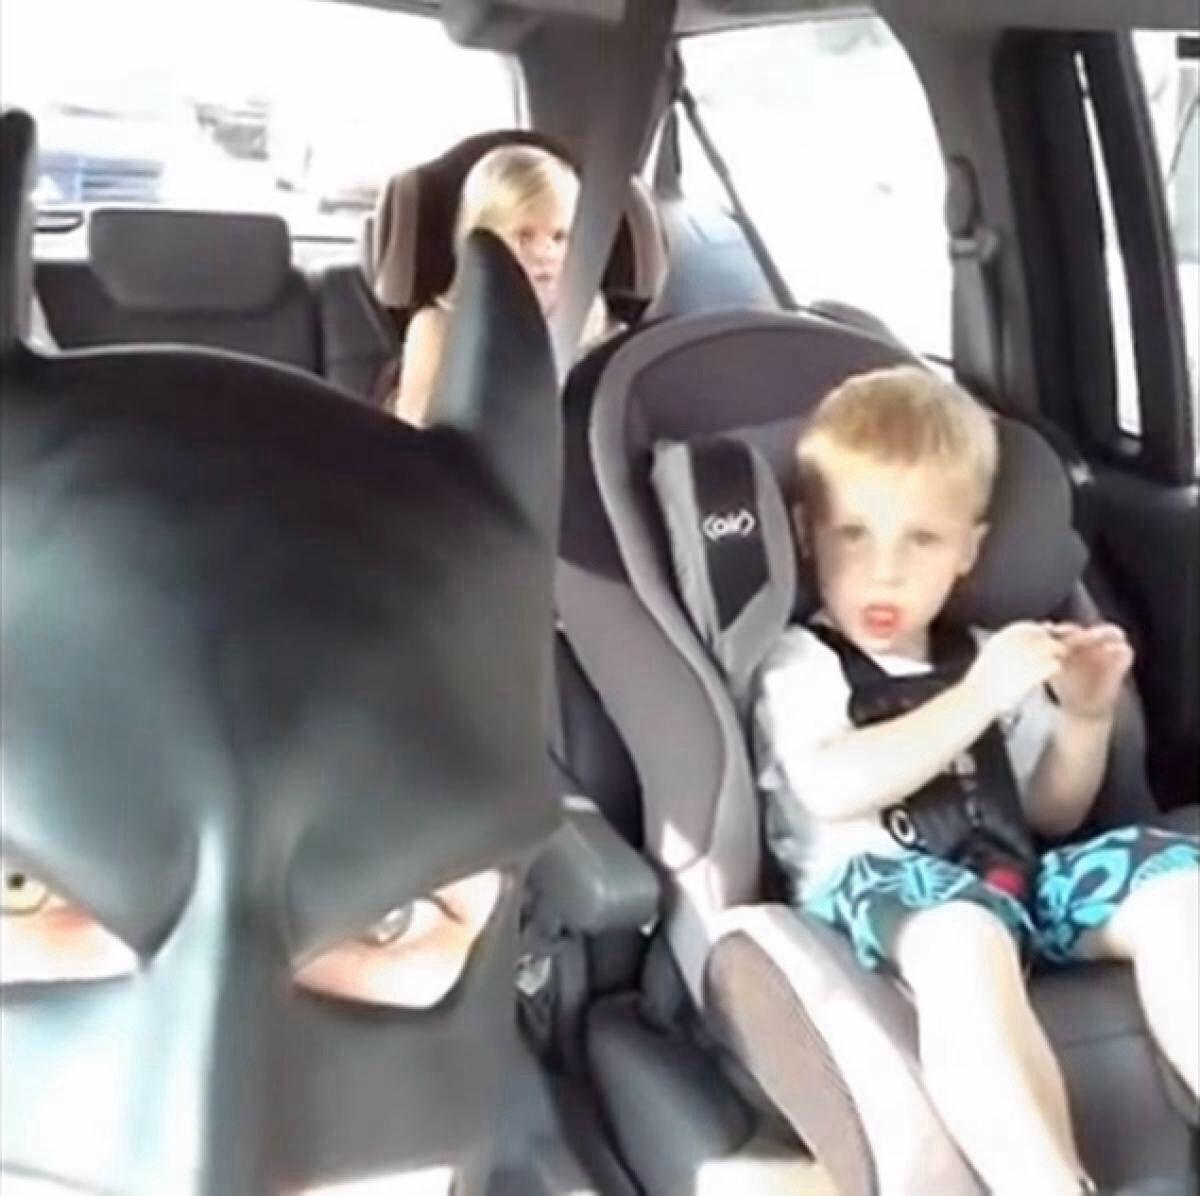 Batman Ben Compilation Peeing Batdad Meme Wwwmiifotoscom